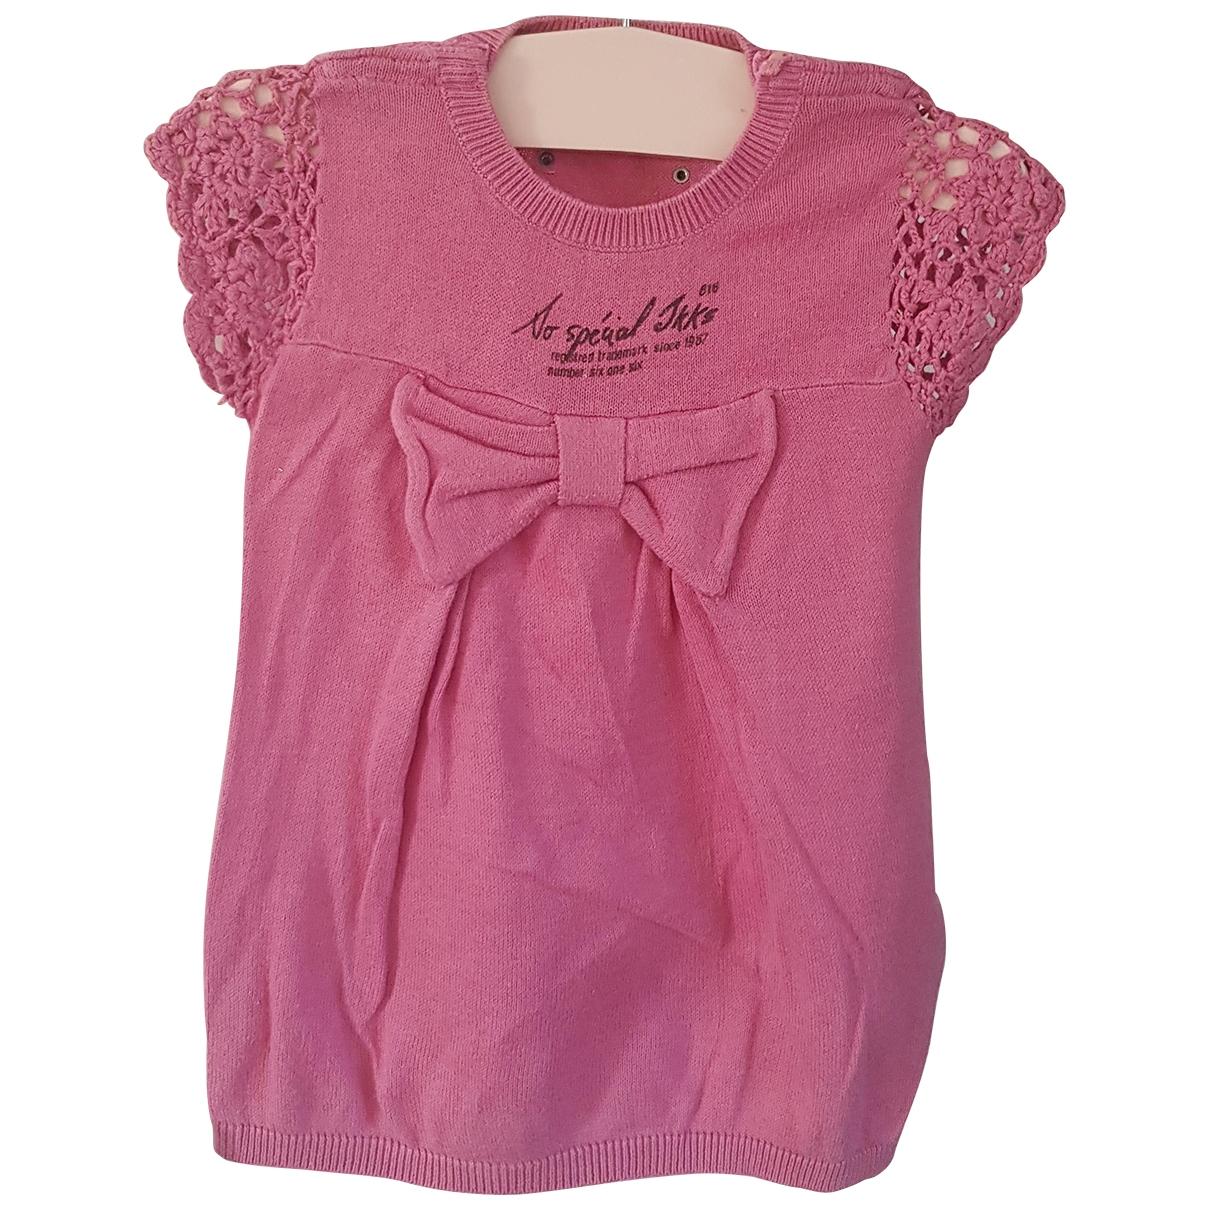 Ikks \N Pink Cotton dress for Kids 3 months - up to 60cm FR